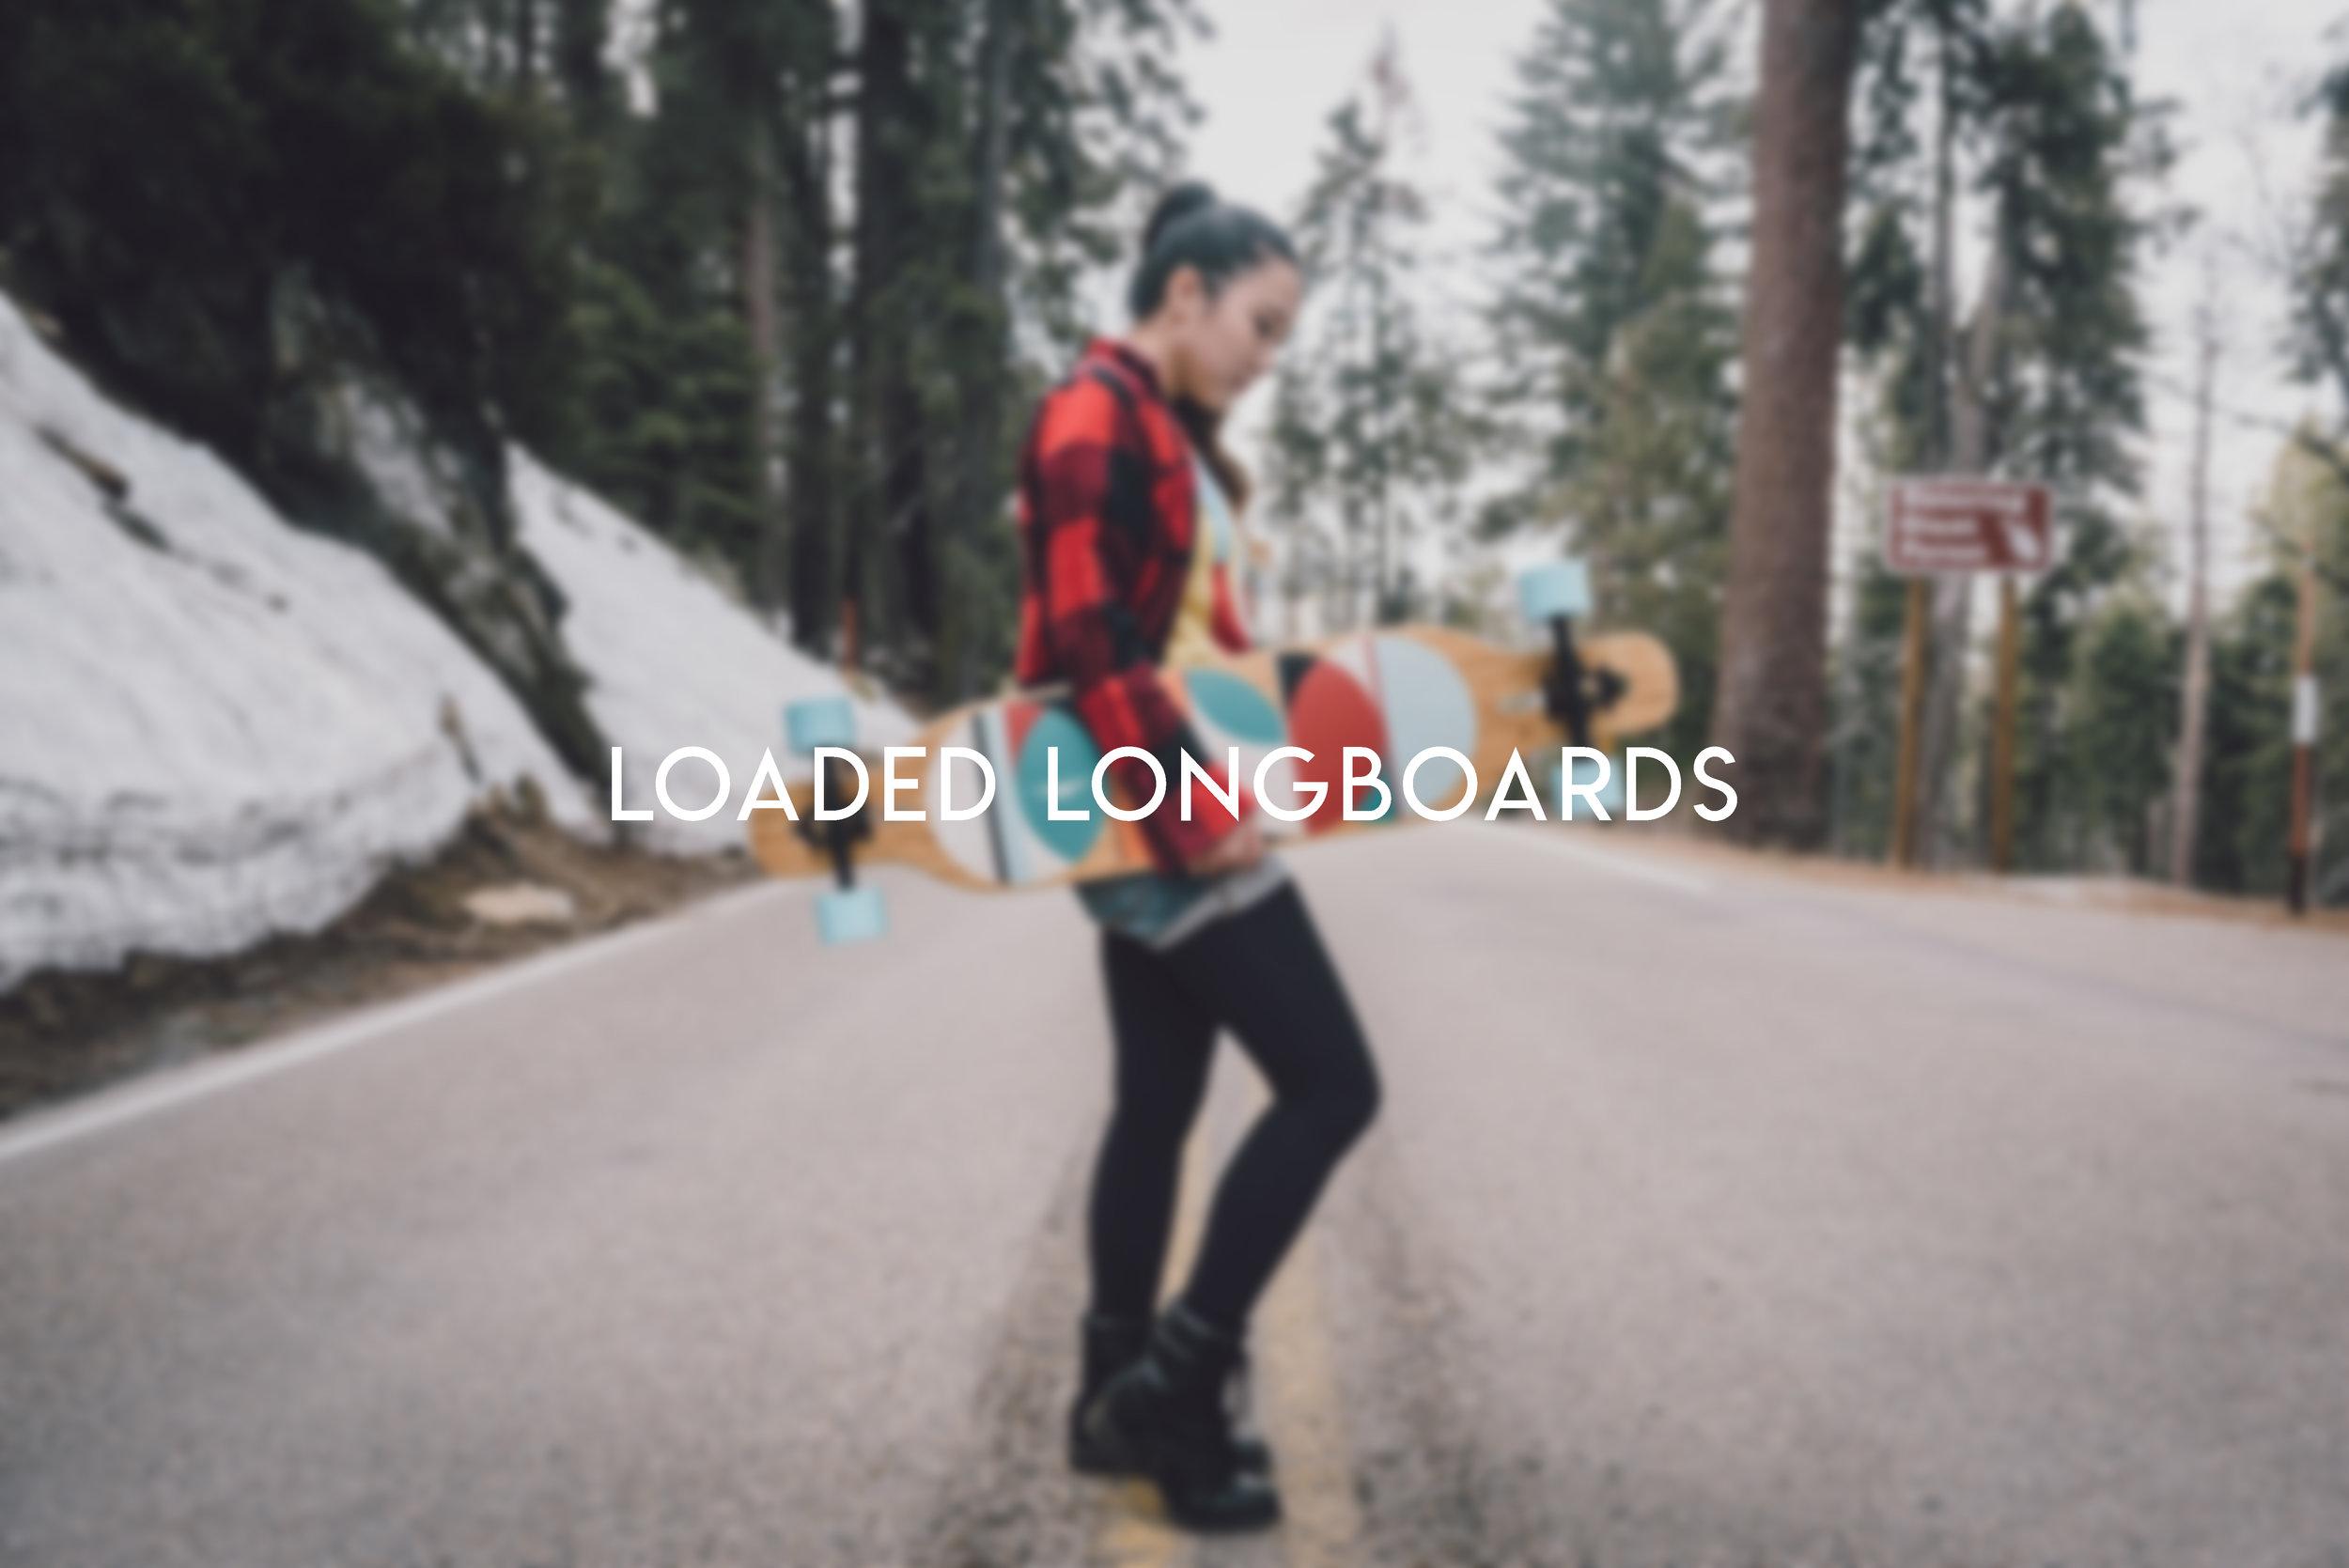 Loaded Longboards Cover Photo.jpg